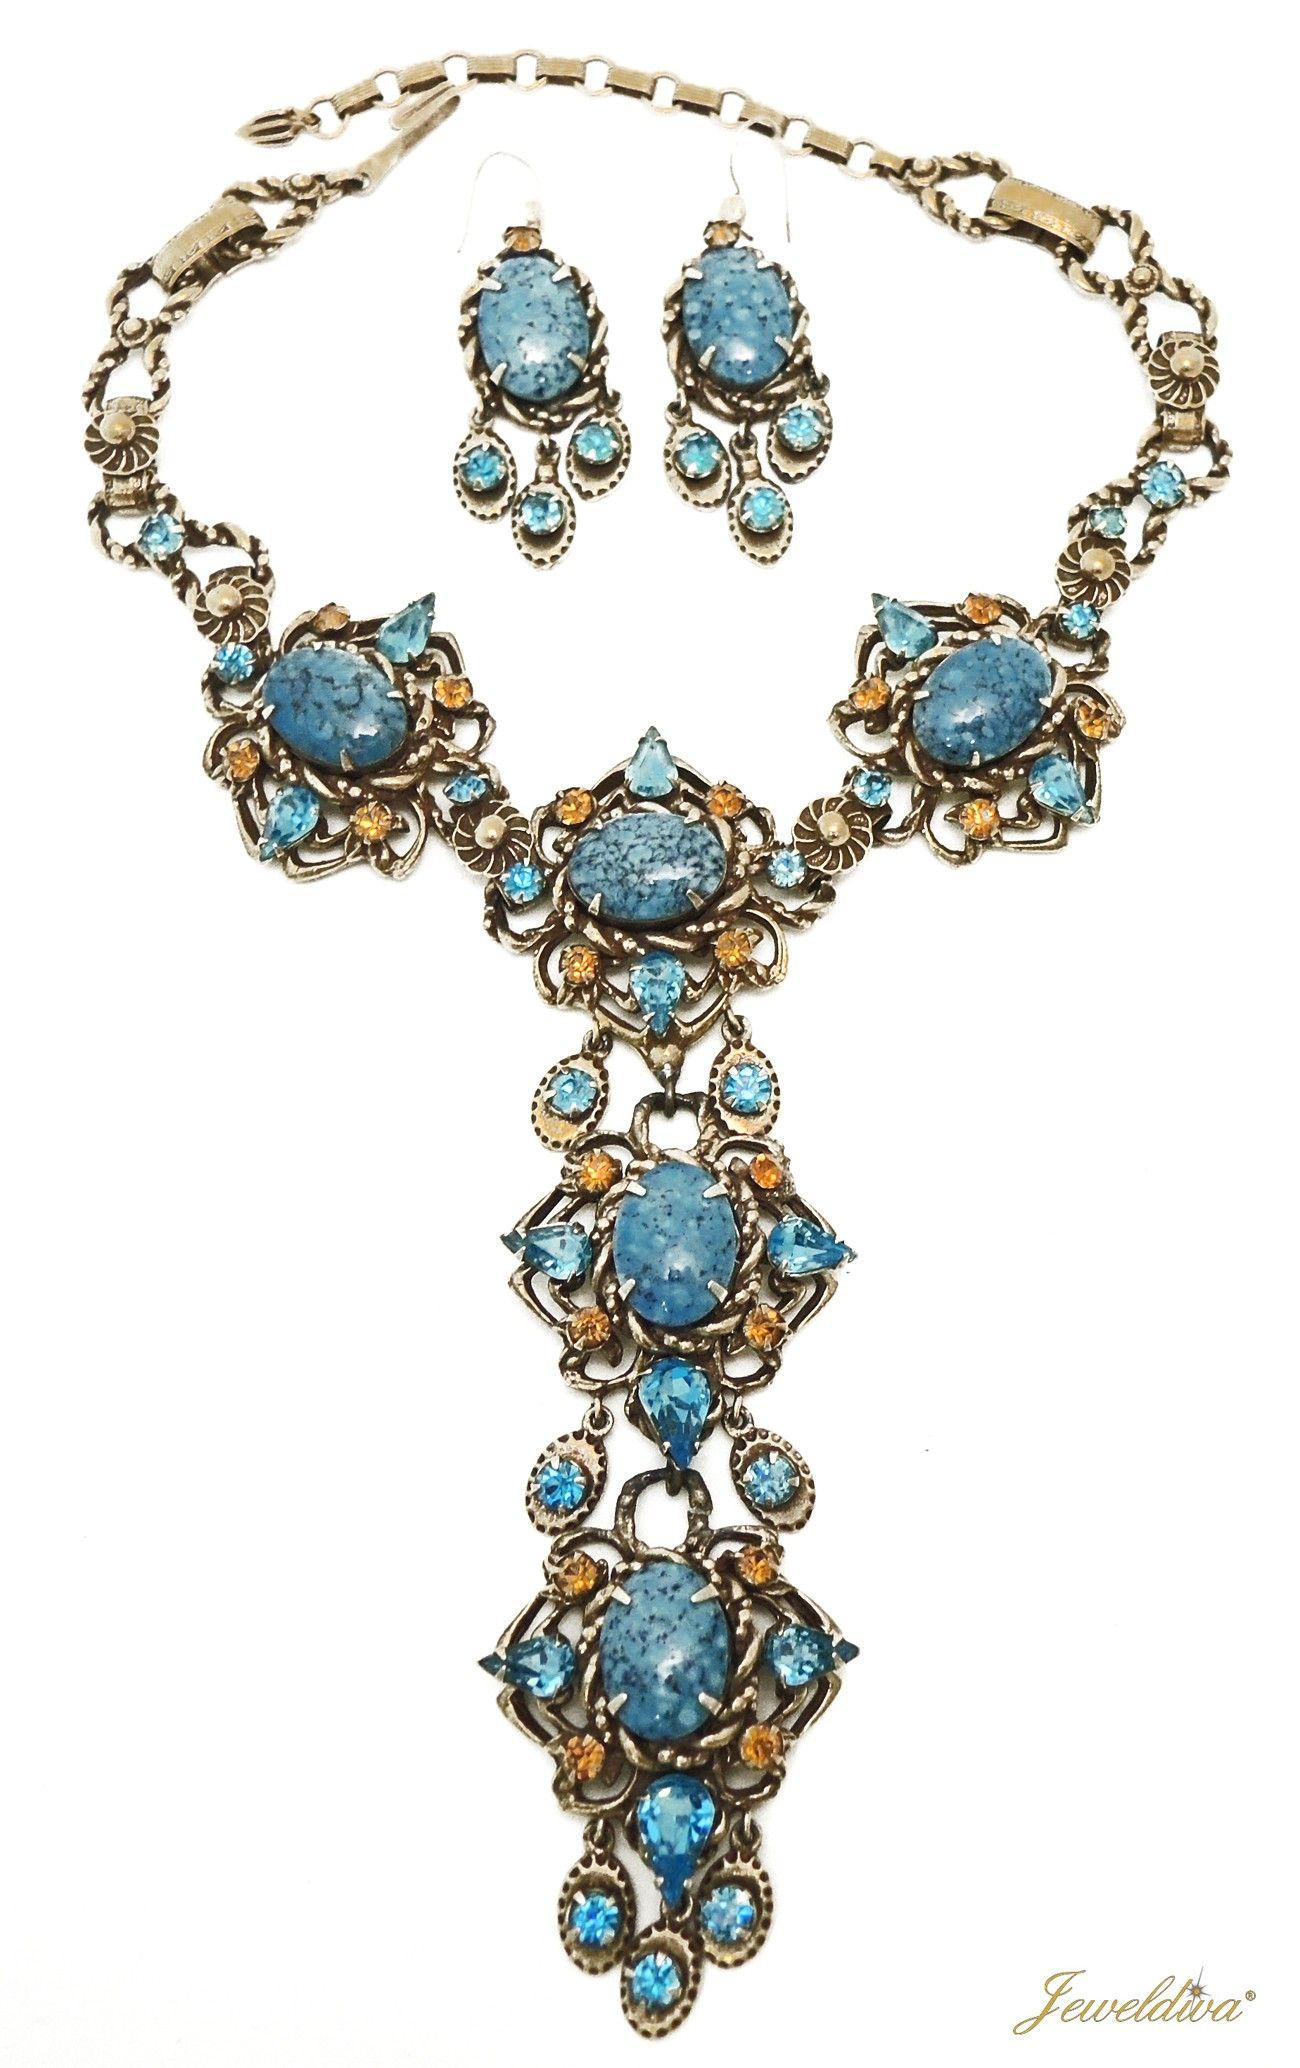 Vintage Signed Christian Dior by Kramer Necklace Earrings